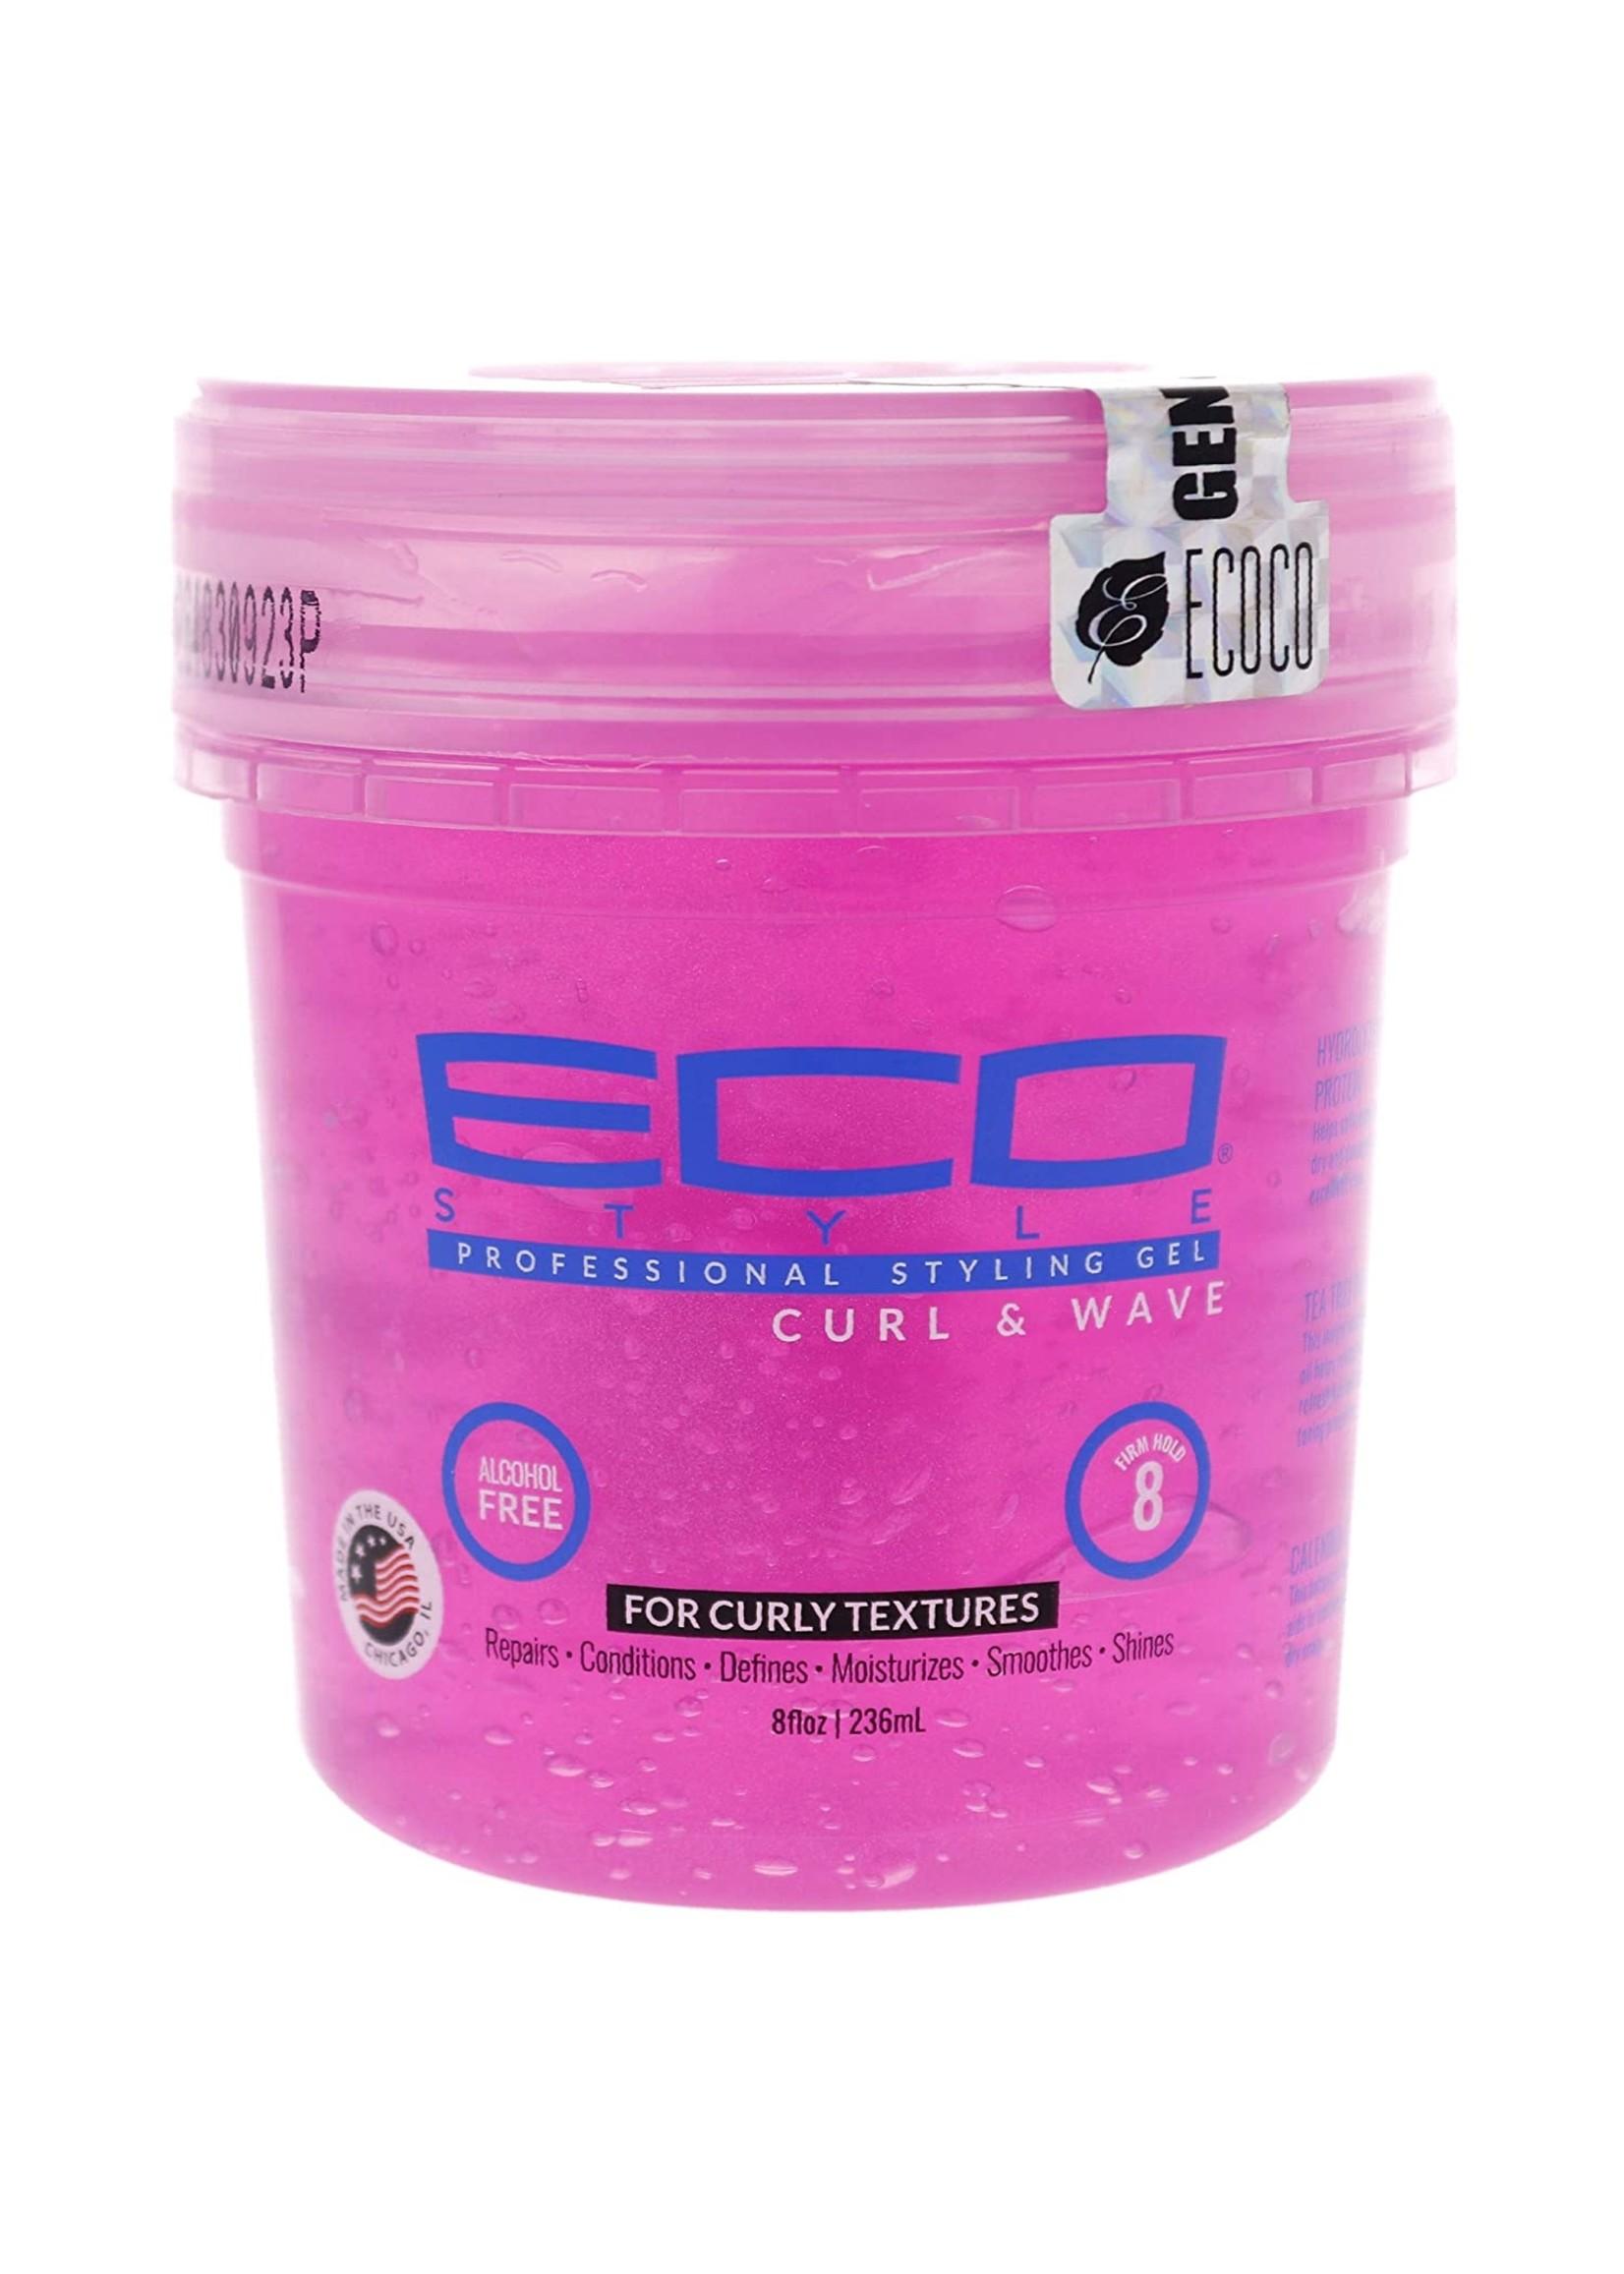 Eco Styling Gel 8oz. Curl & Wave